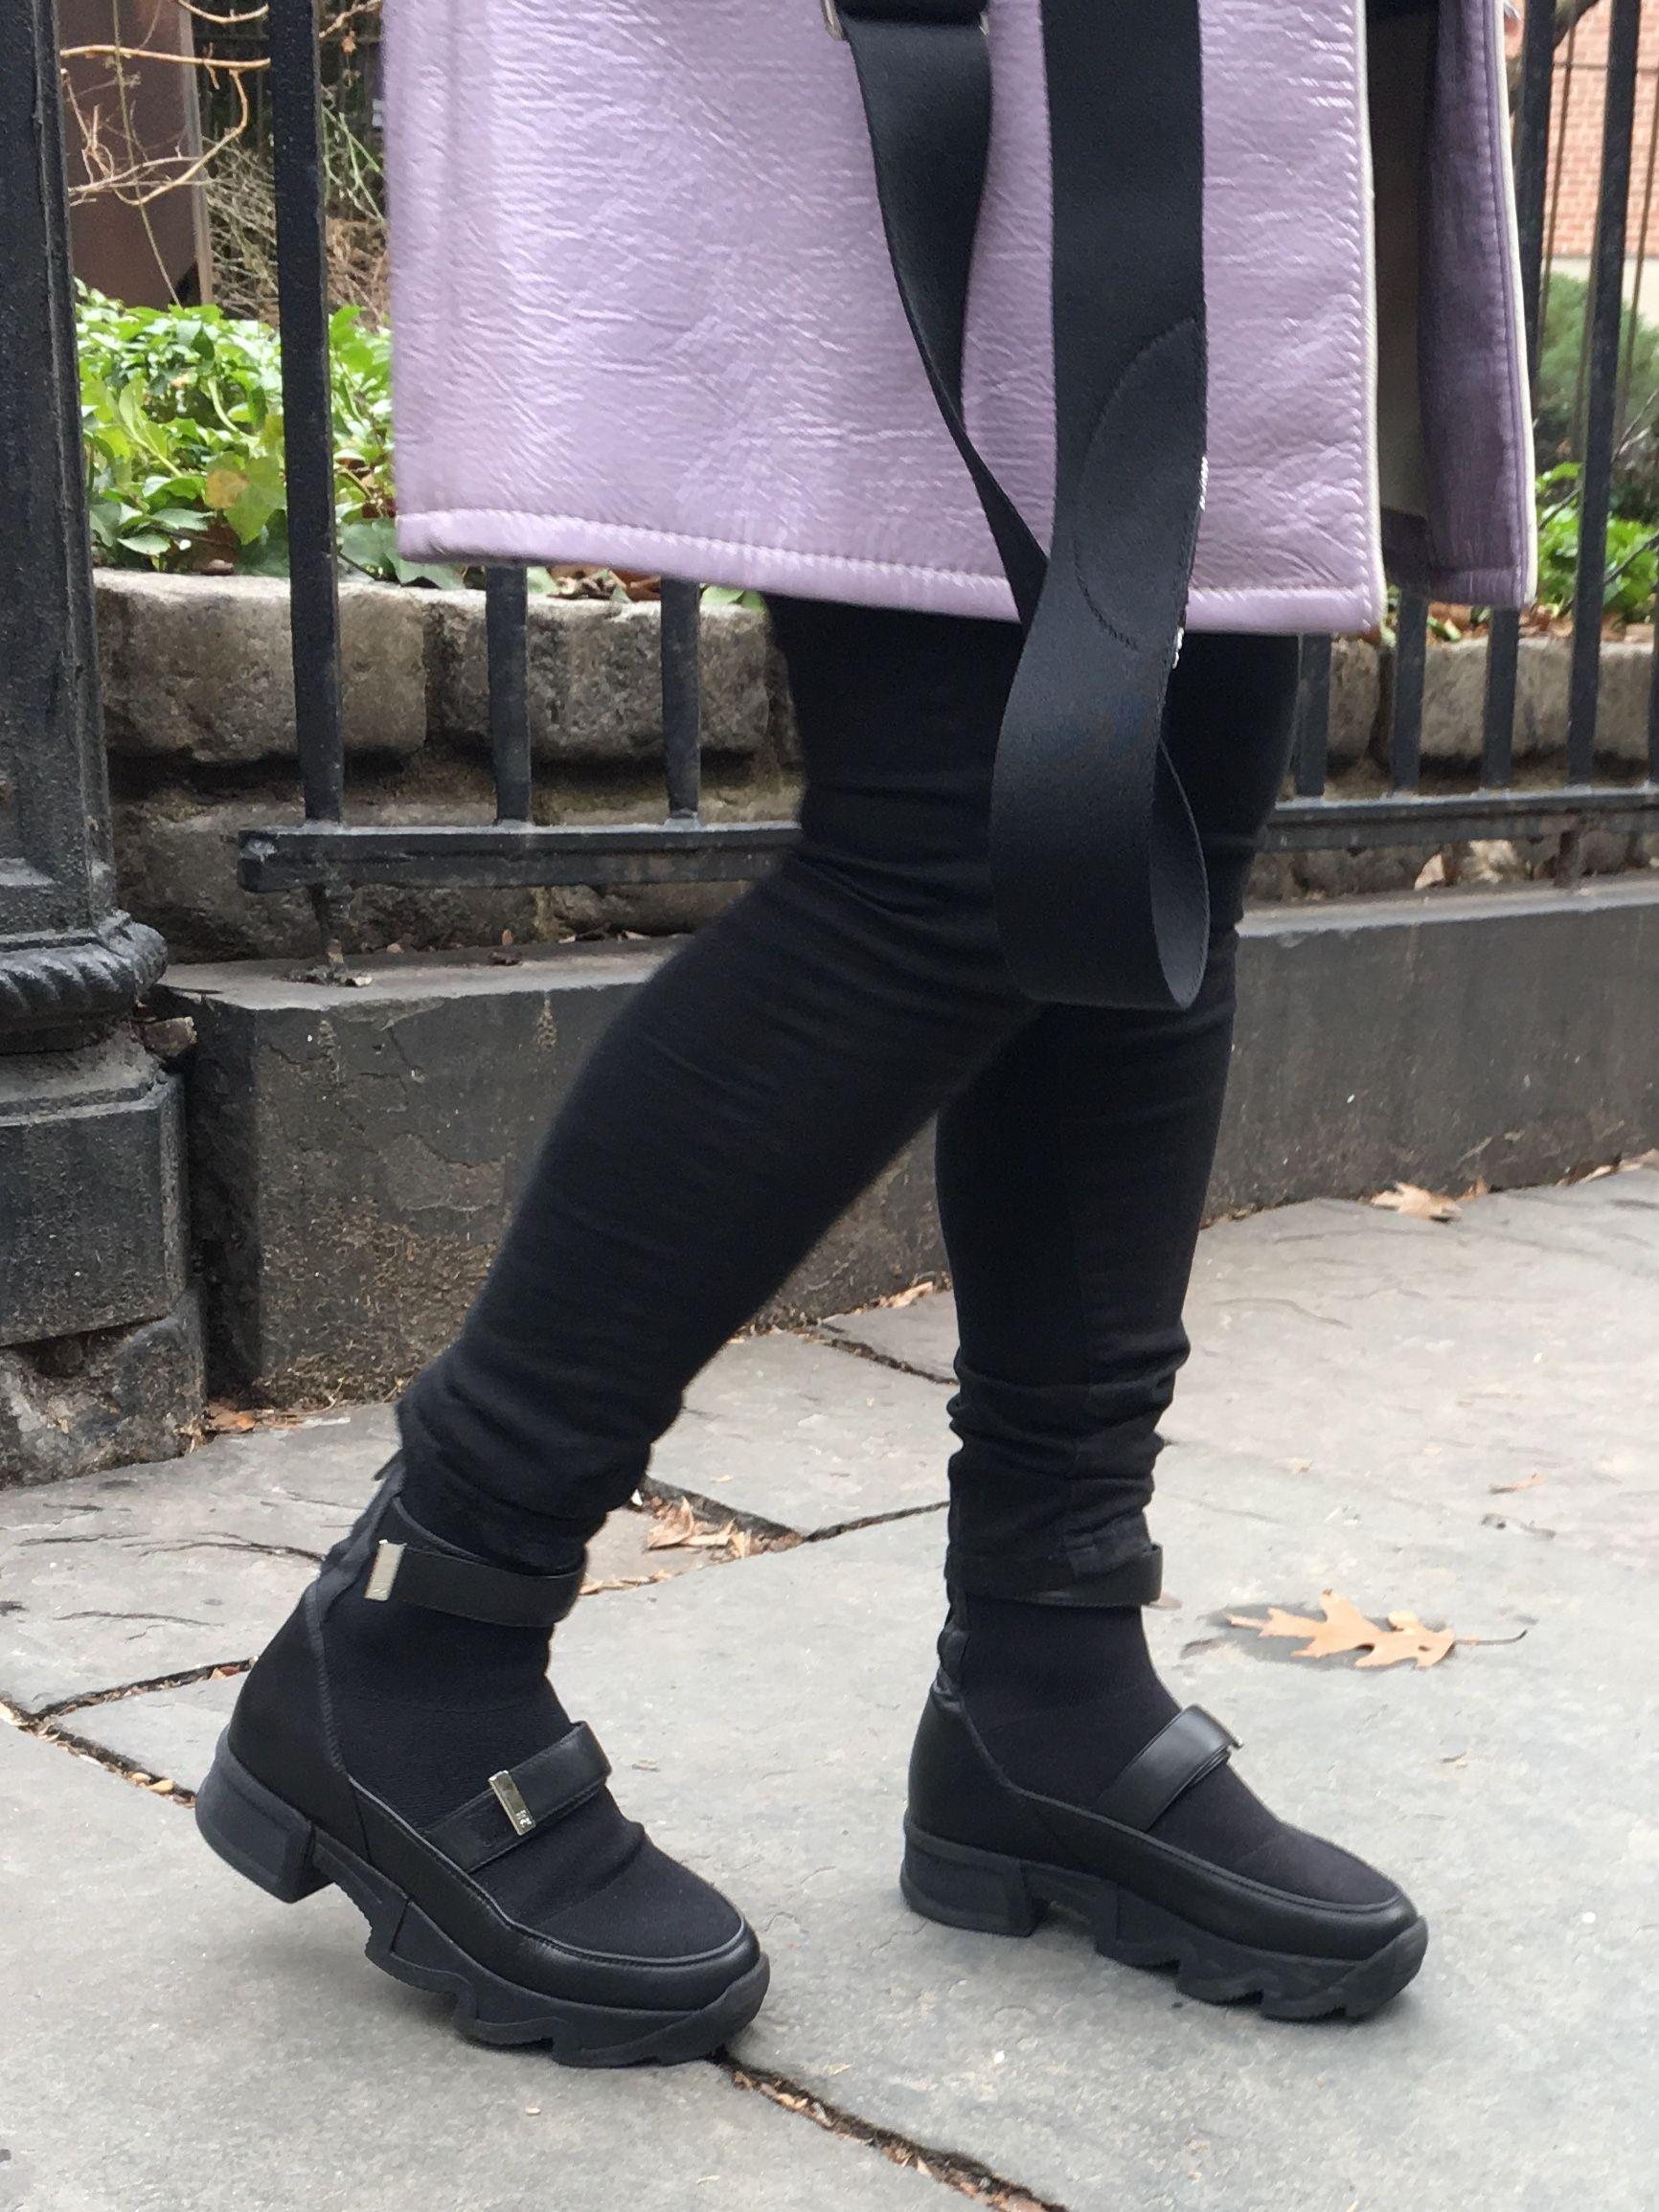 3dd63c2aa32 Black Sock Sneaker Available now - www.irinyc.com  irinyc  sneakers